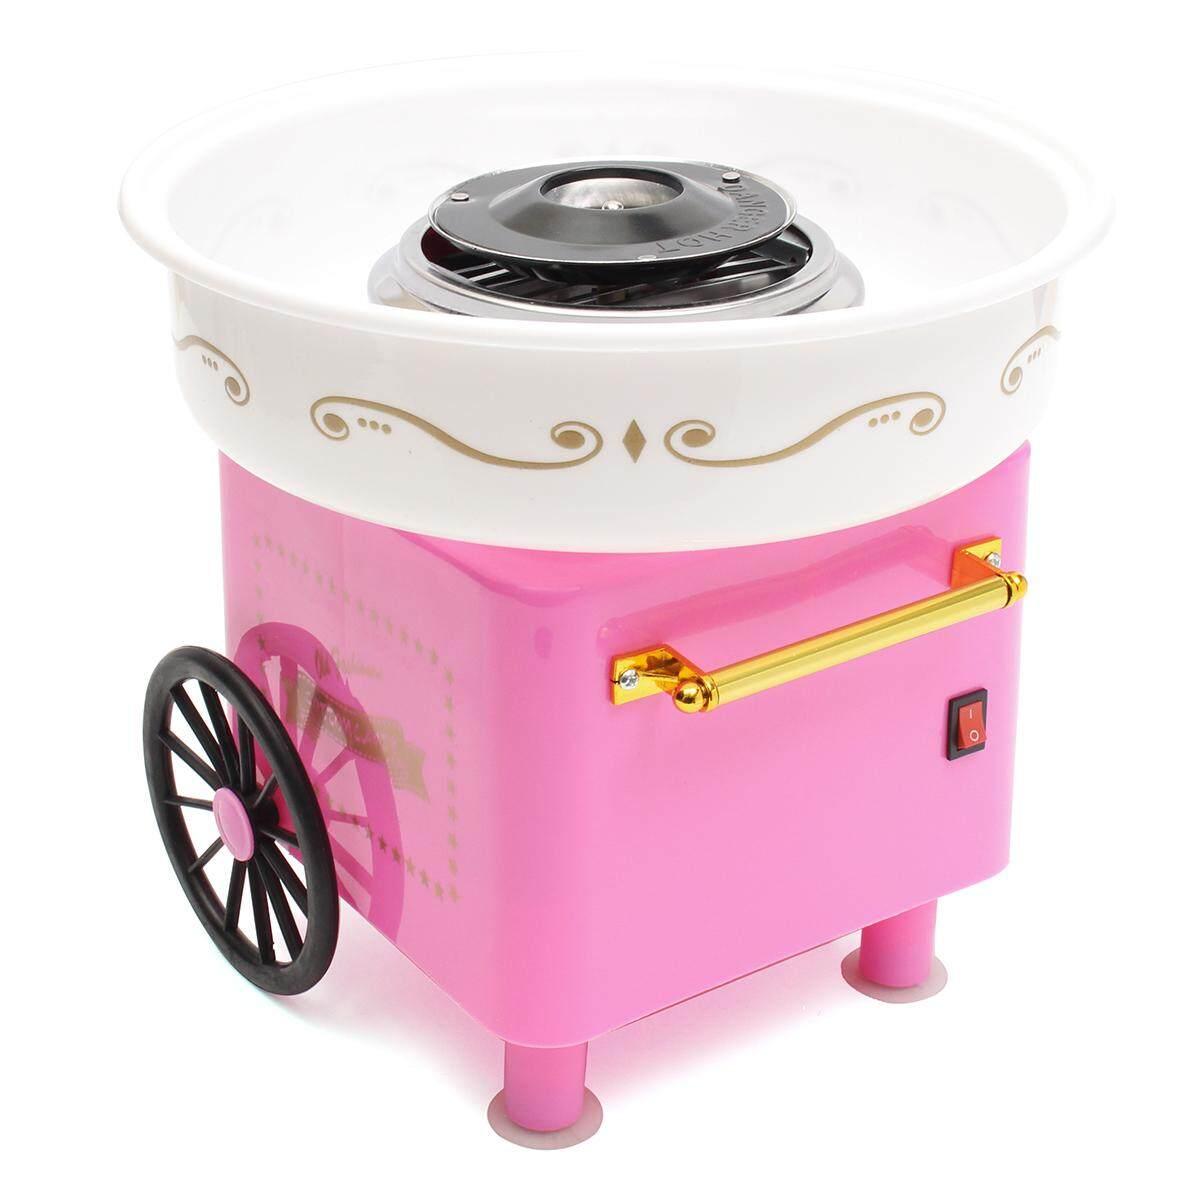 Hình ảnh Commercial Cotton Candy Machine Maker Kids Party Carnival Sugar Free Home